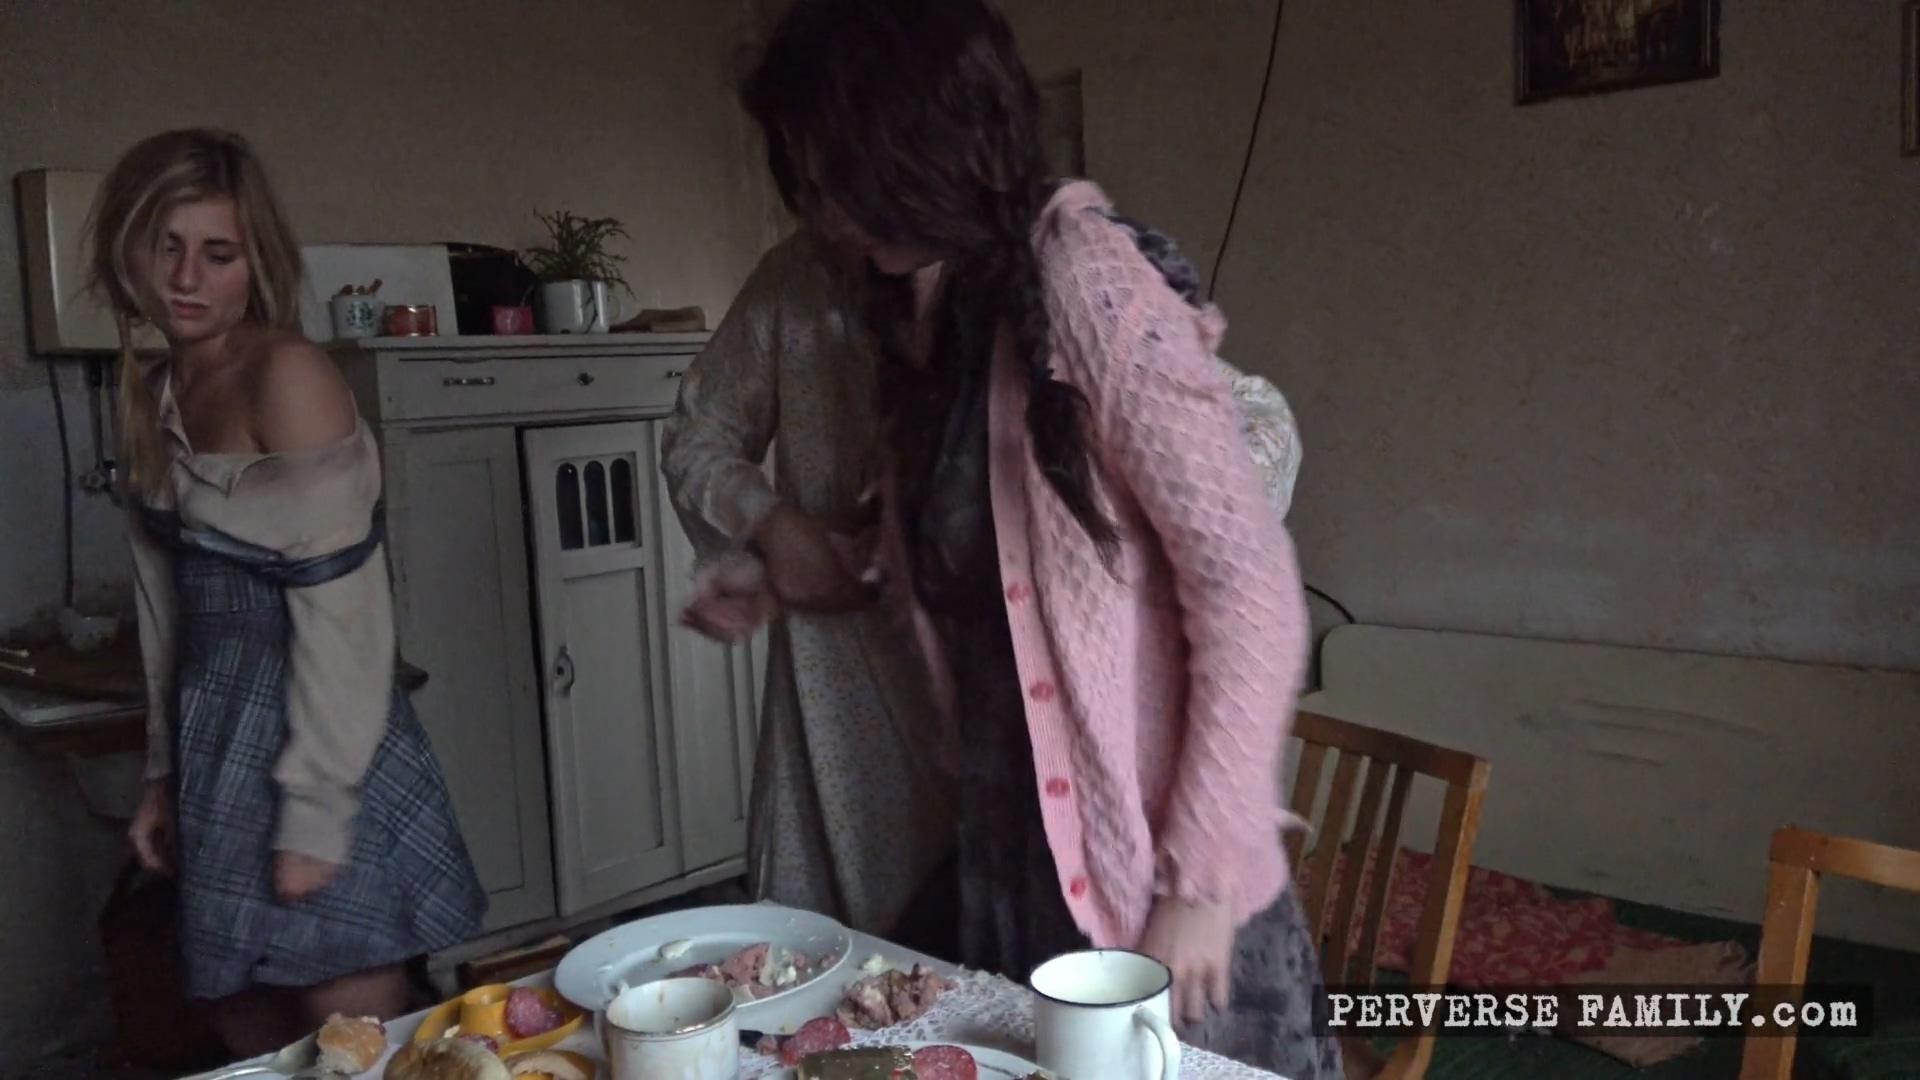 perverse-family-unexpected-breakfast-1920x1080_mp4_20191031_085741_751.jpg